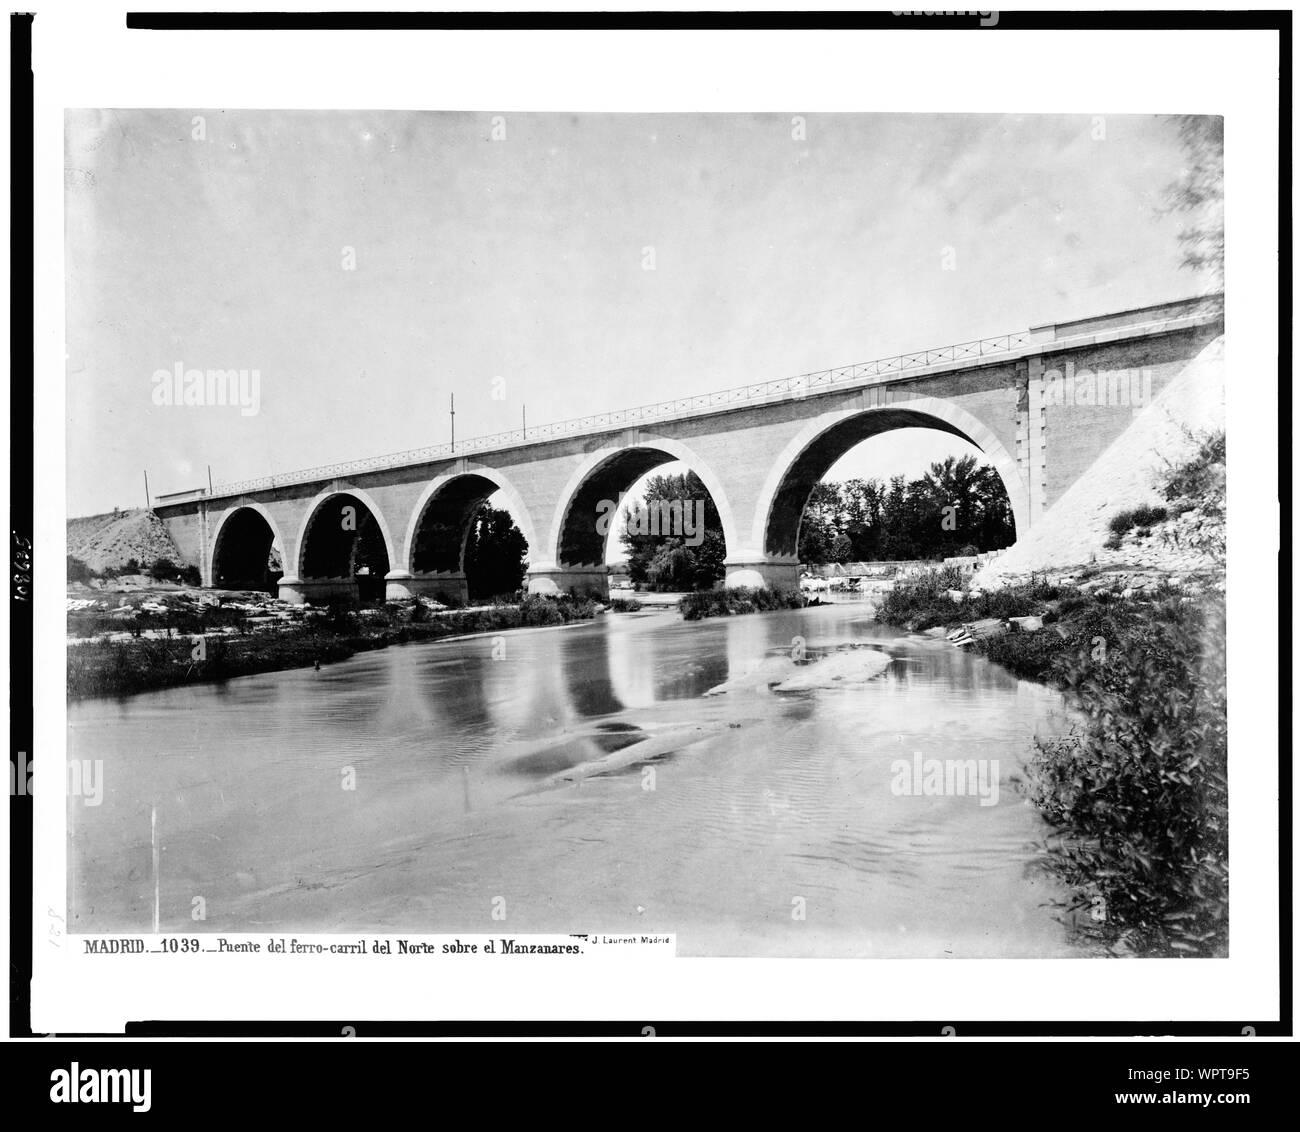 Madrid. Puente del ferro-carril del Norte sobre el Manzanares / J. Laurent. Madrid. Stock Photo